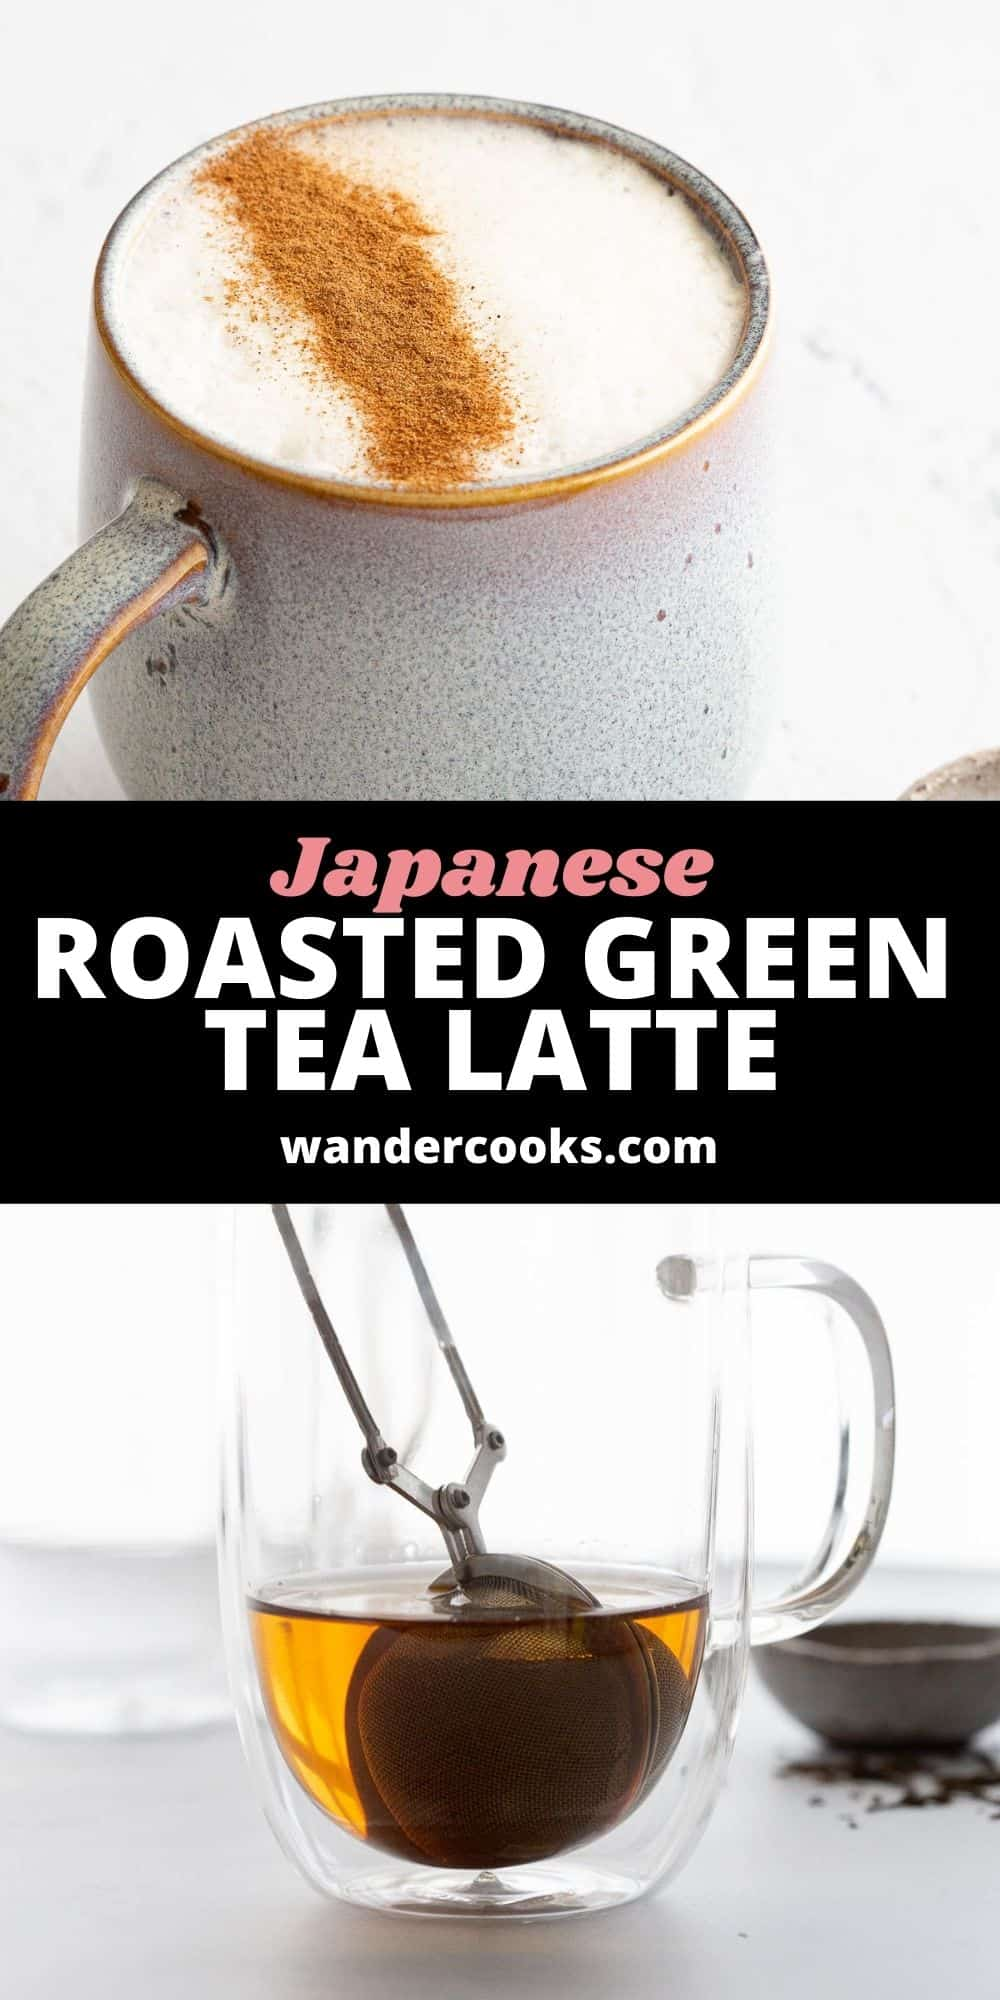 Hojicha Latte - Japanese Roasted Green Tea Latte